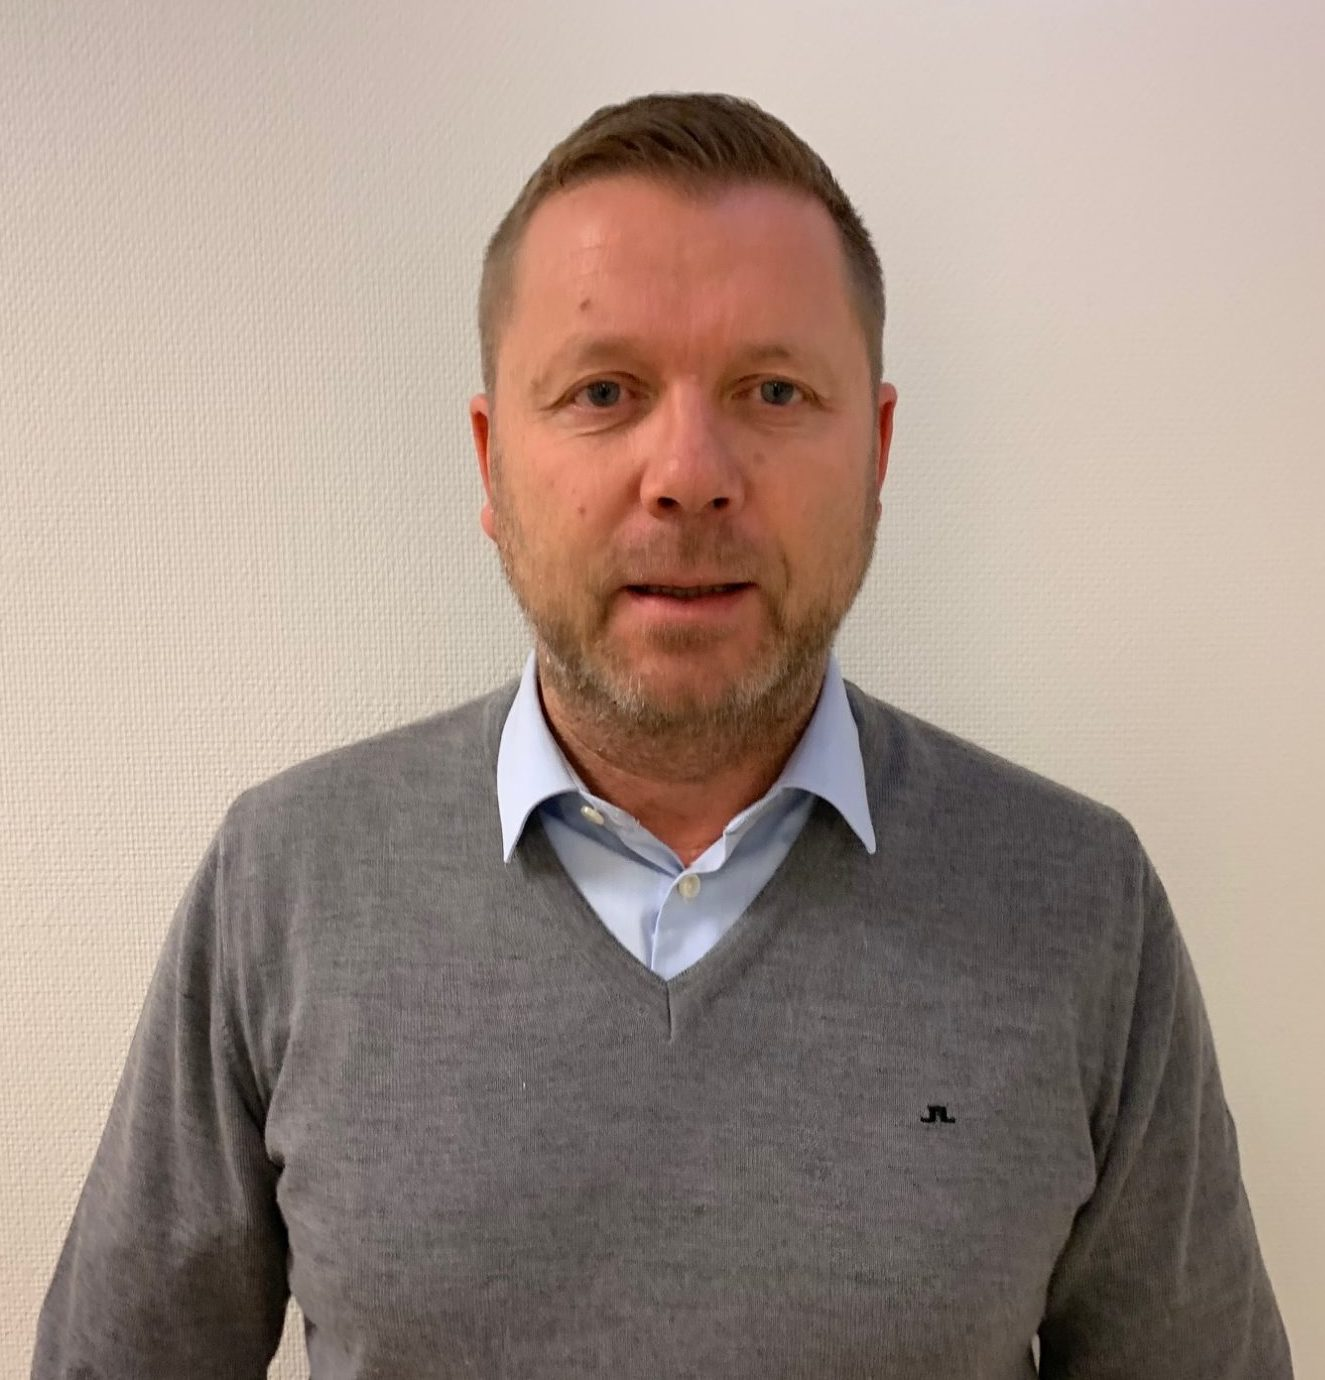 Knut Einar Bordi